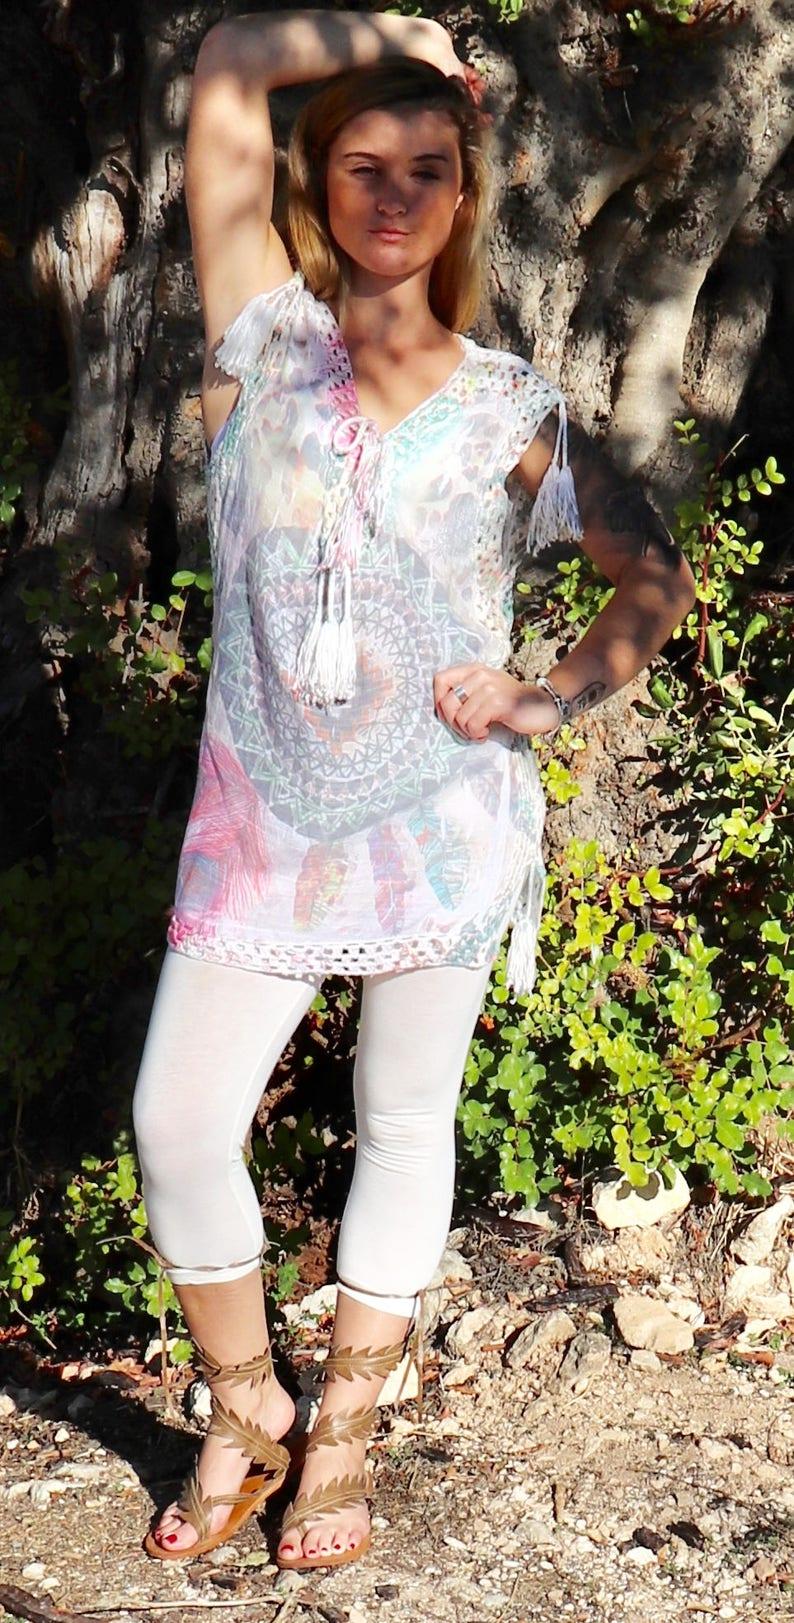 534cf0ef5efeb6 Women Tunic Tops For LeggingsWomens Tunic DressCotton